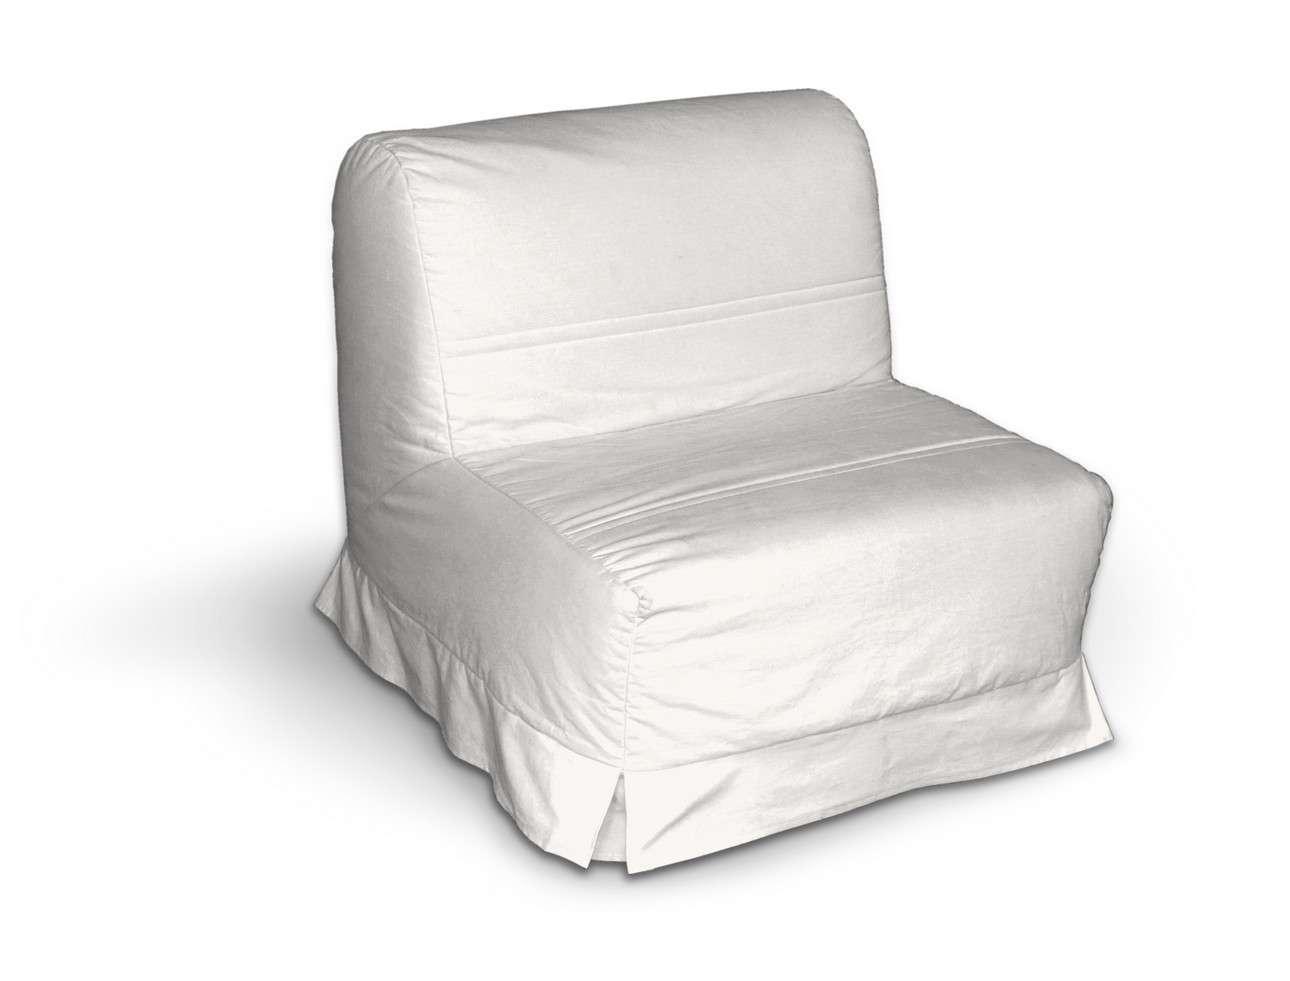 Lycksele Sesselbezug mit Kellerfalten Lycksele von der Kollektion Cotton Panama, Stoff: 702-34